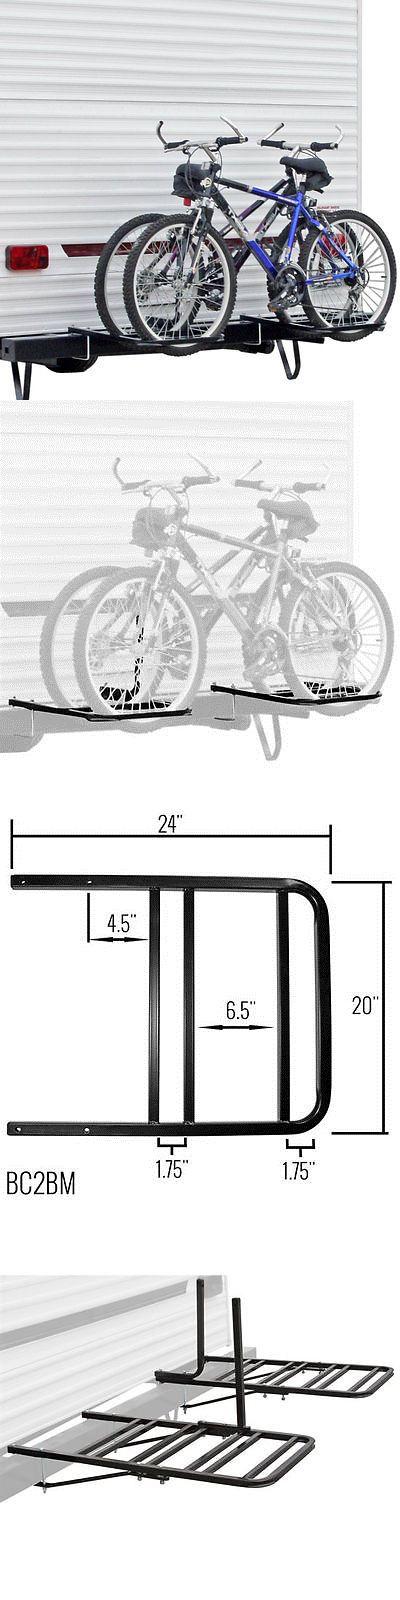 Car and Truck Racks 177849: Rv Bumper Bike Rack - 4 Bike Motorhome Bike Carrier -> BUY IT NOW ONLY: $99.99 on eBay!